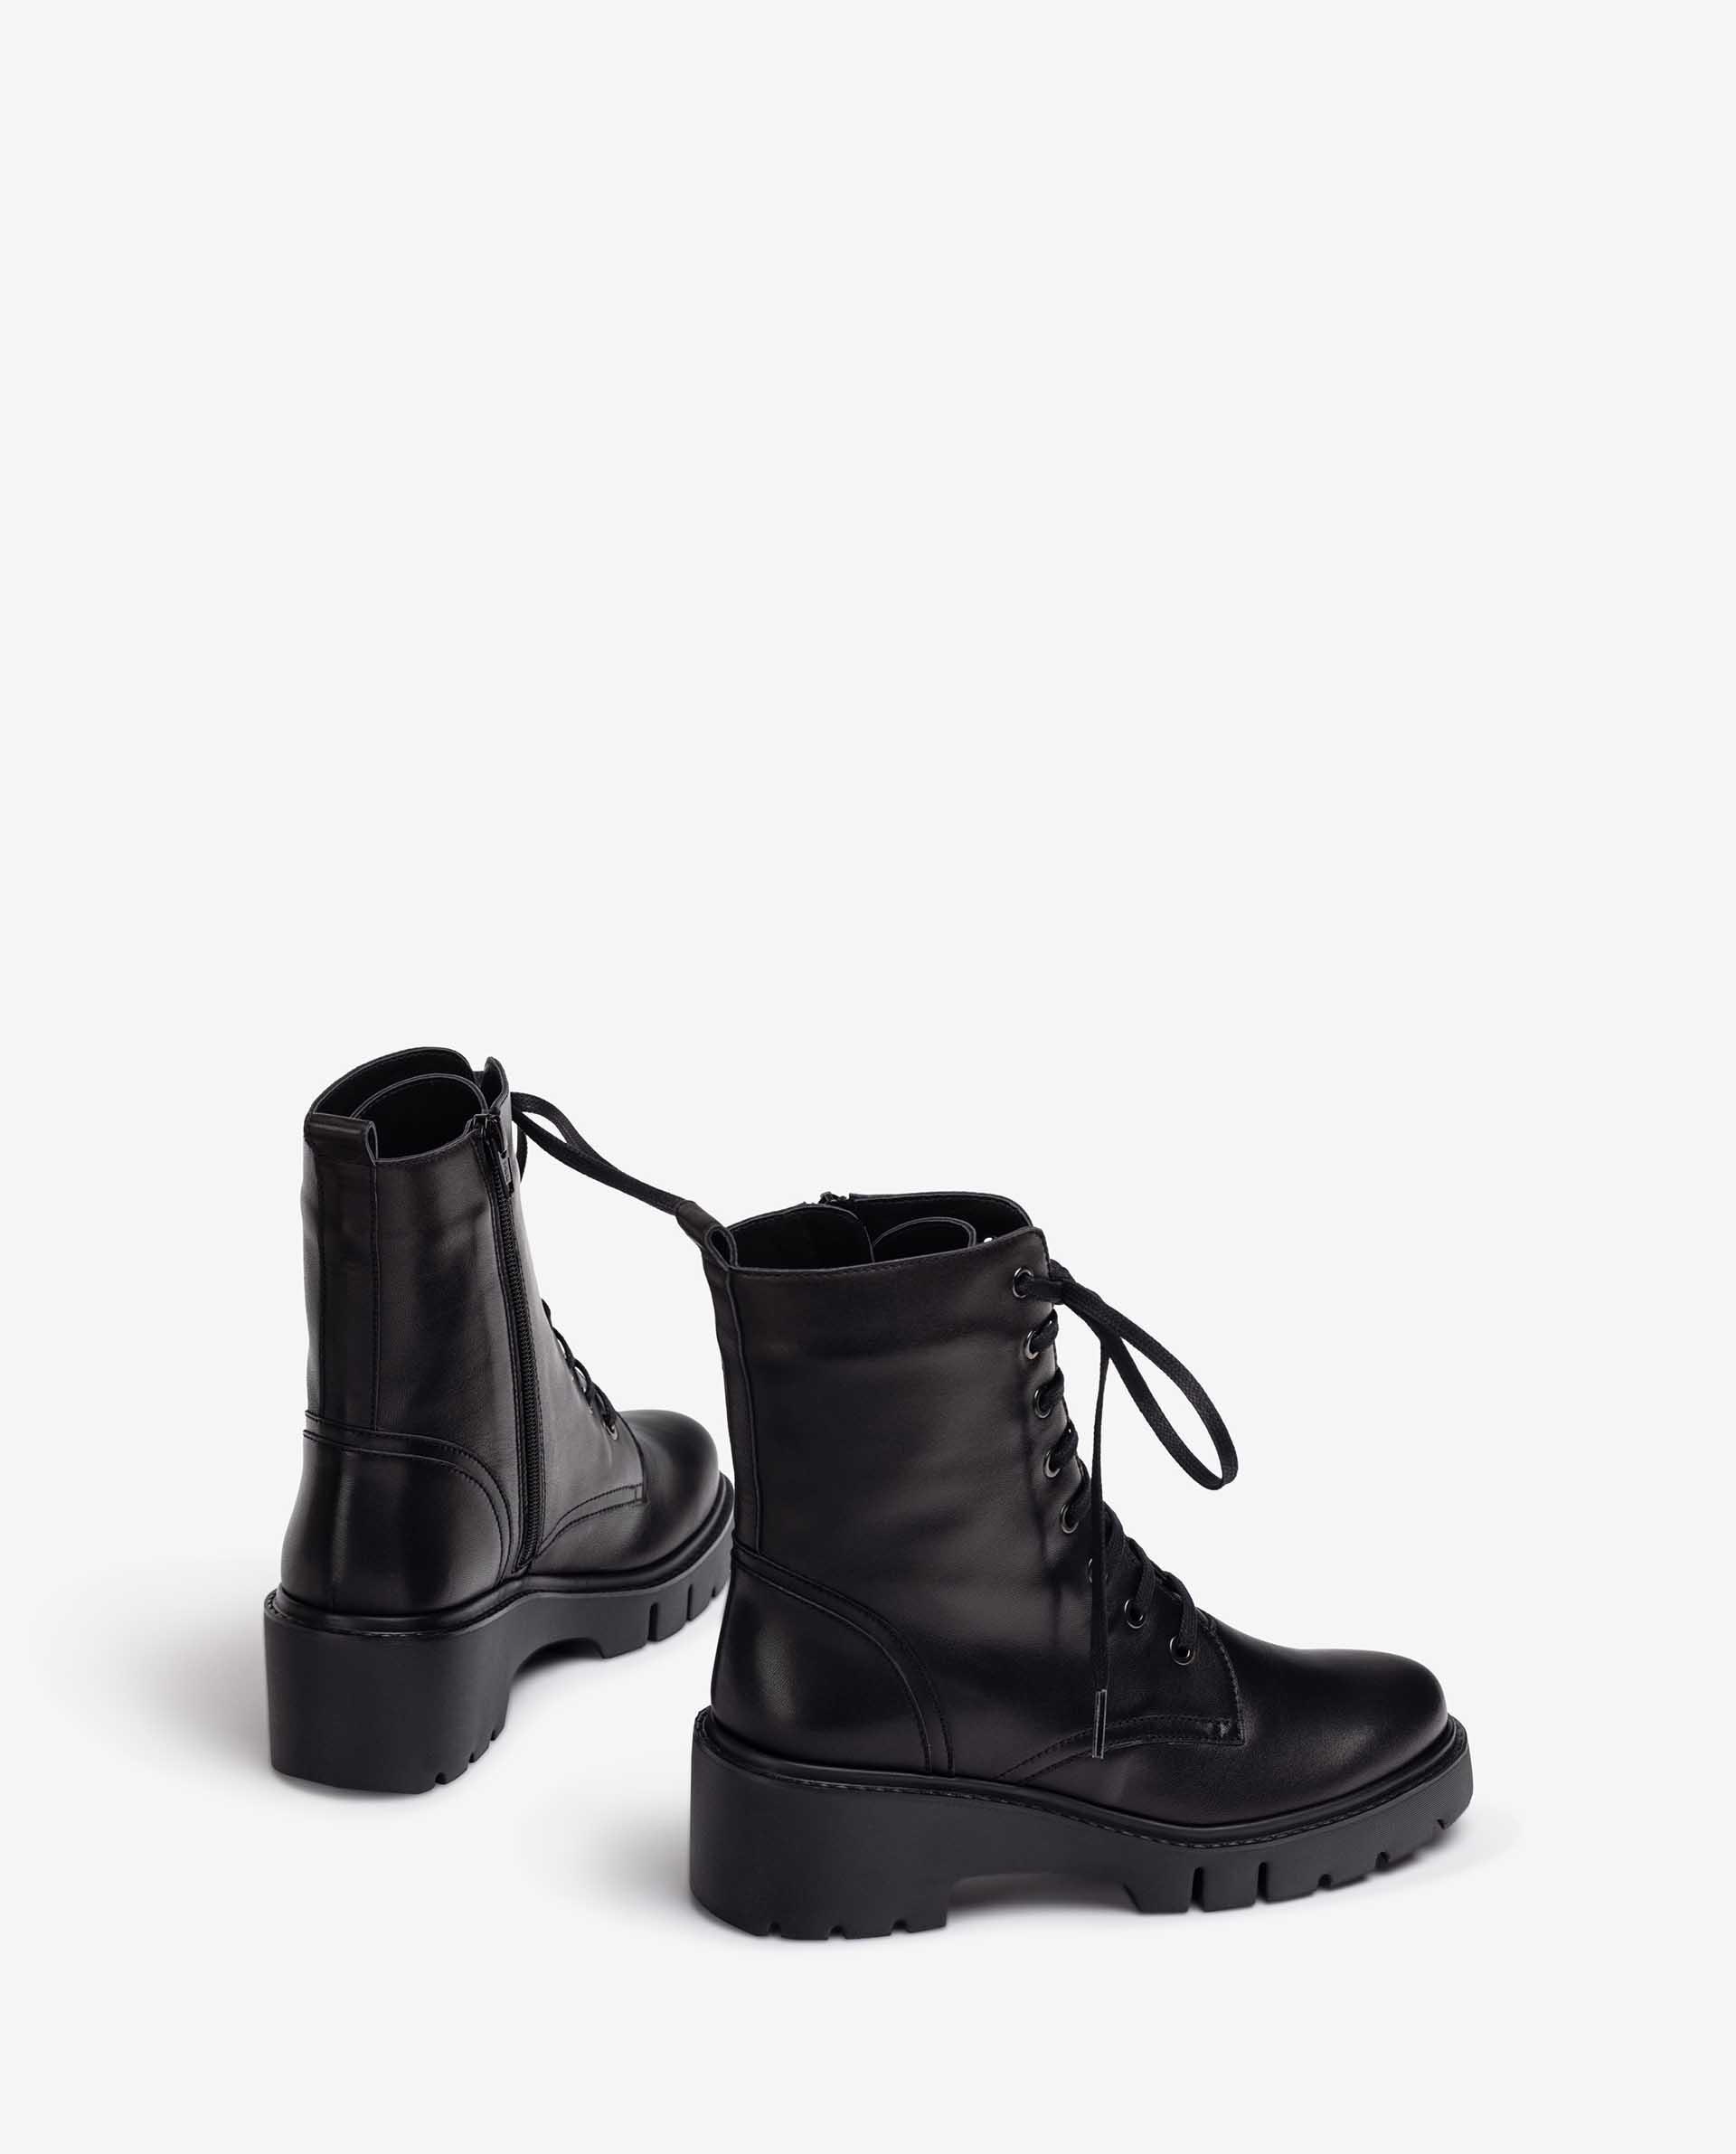 Unisa Ankle boots JRISO_F21_VU black